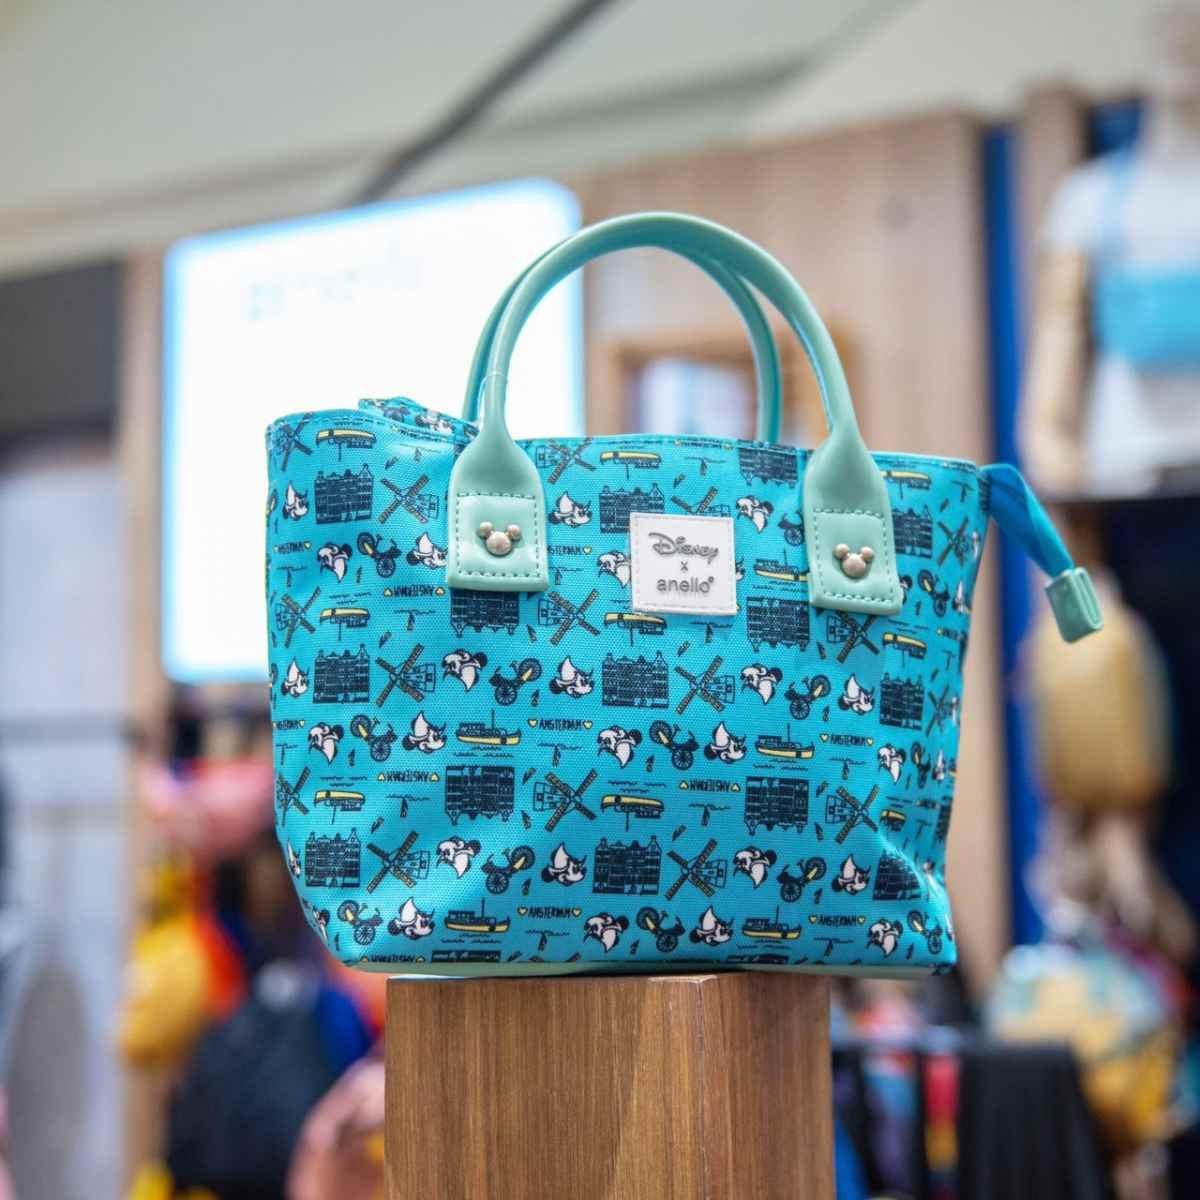 Anello กระเป๋า สีฟ้า